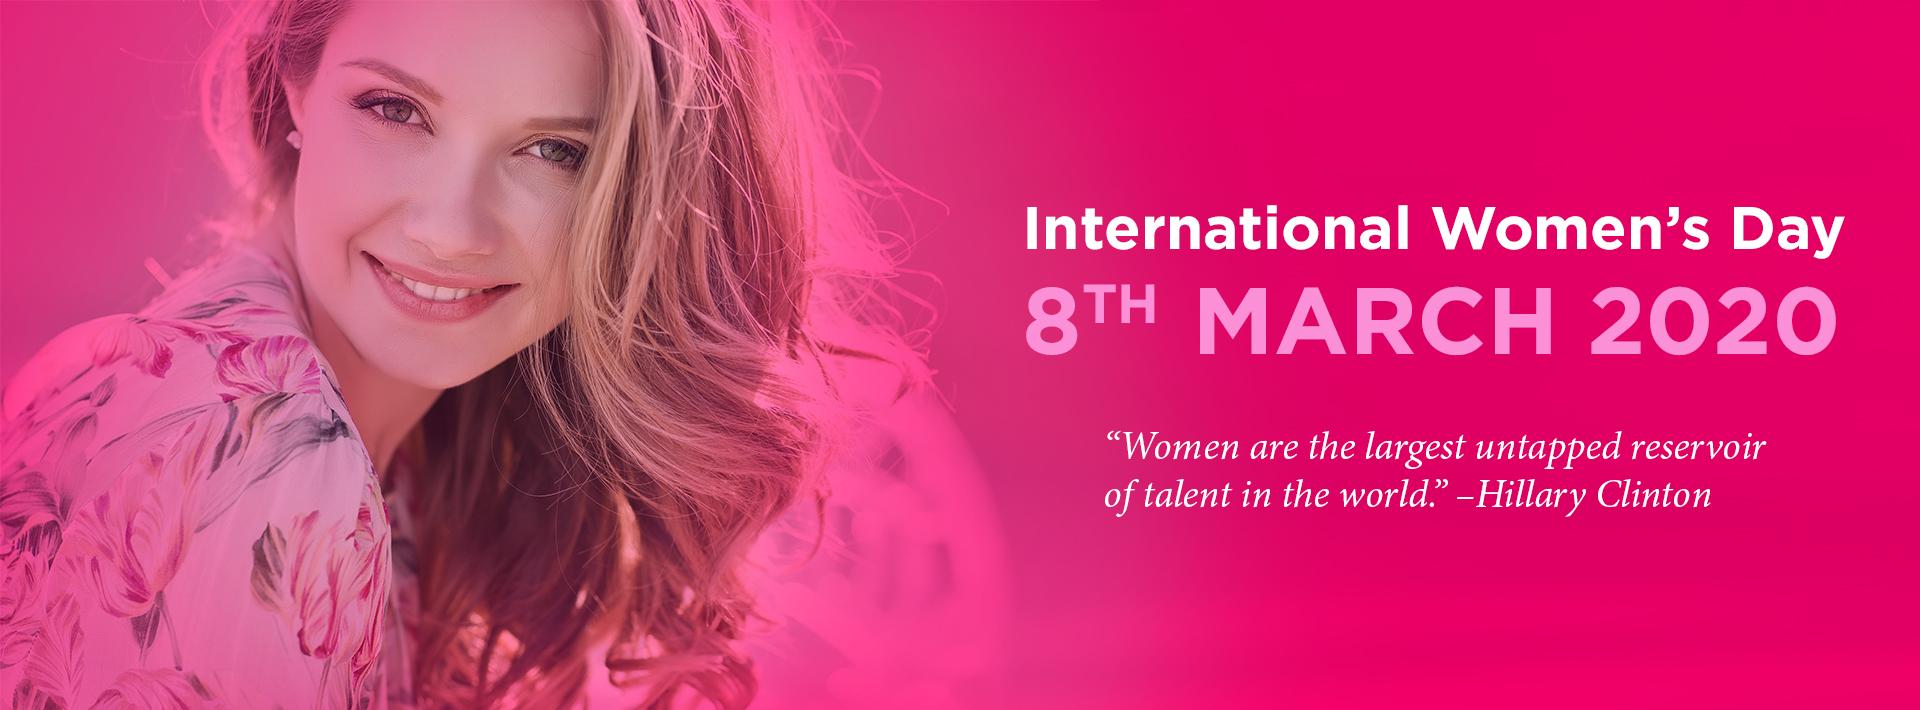 women-smiling-international-womens-day-2020